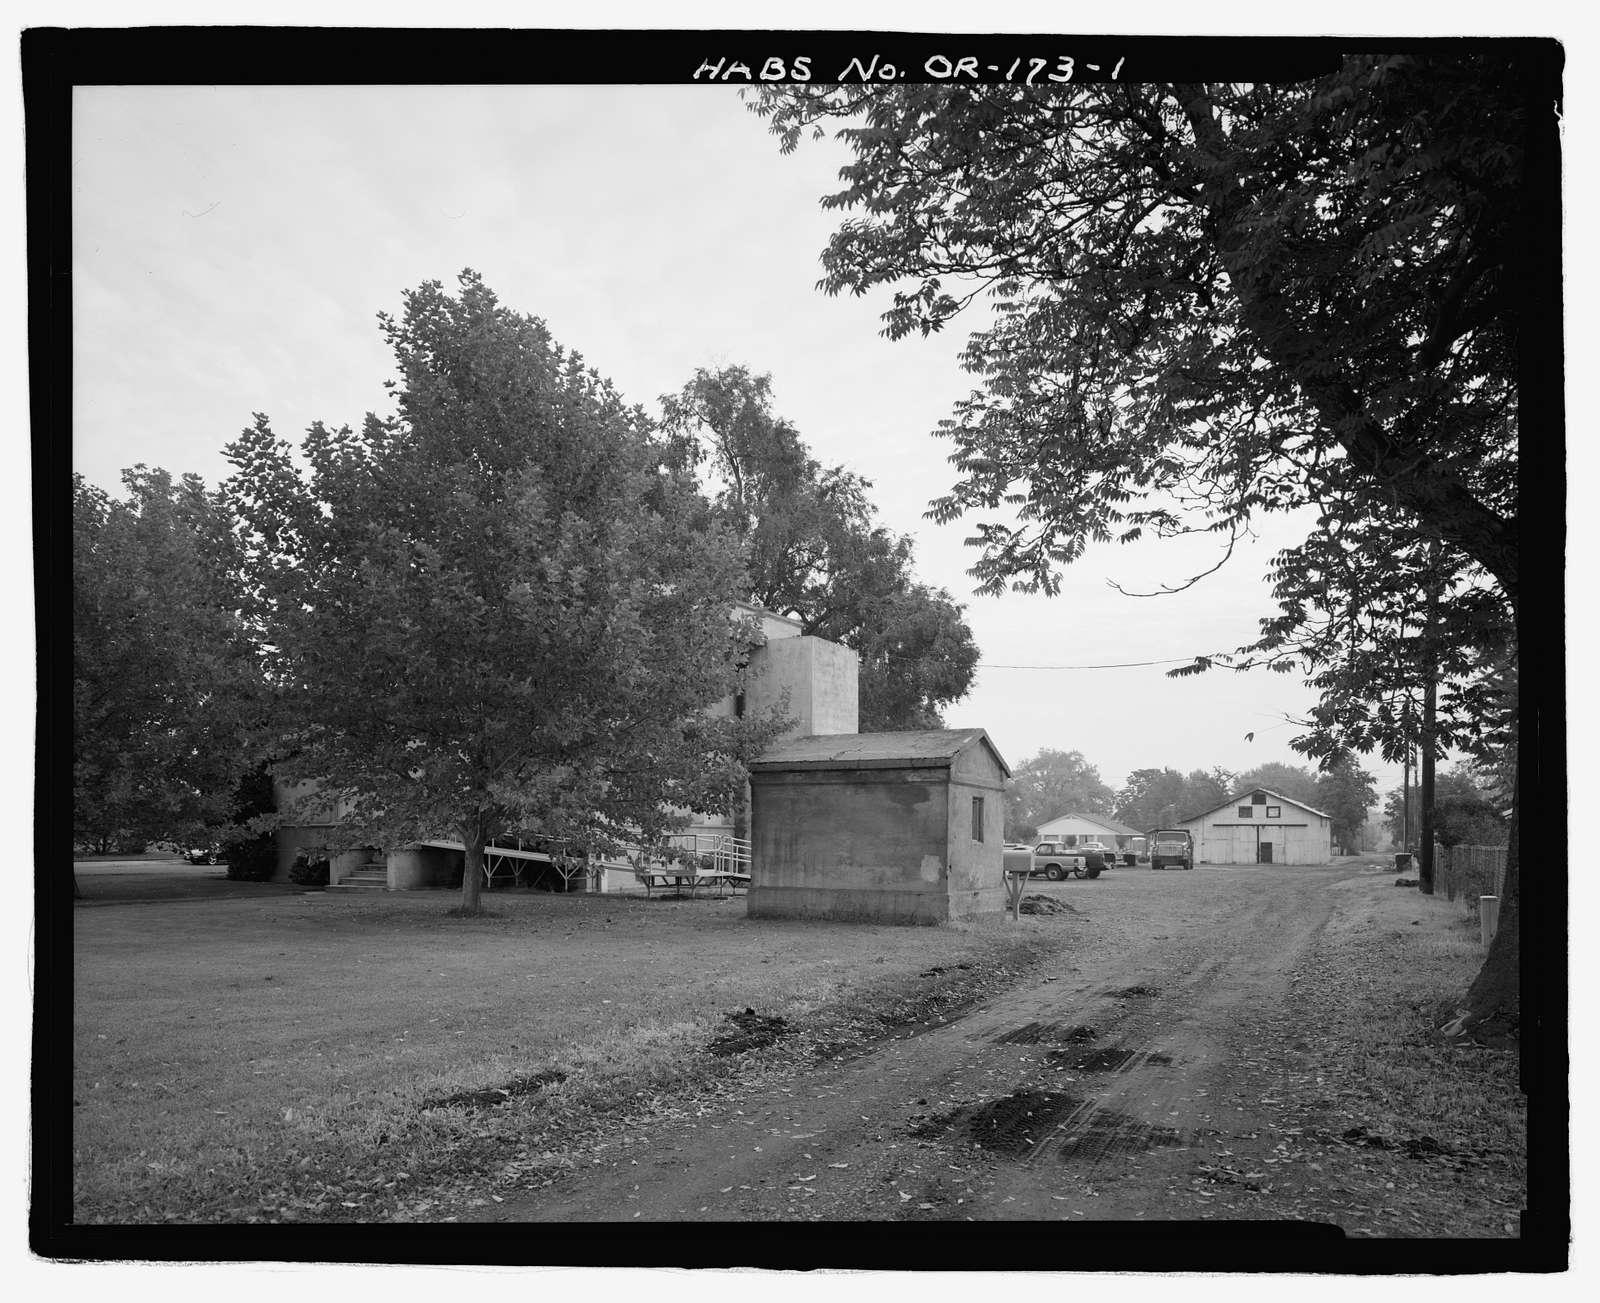 Former Umatilla Project Headquarters Buildings, Hermiston, Umatilla County, OR